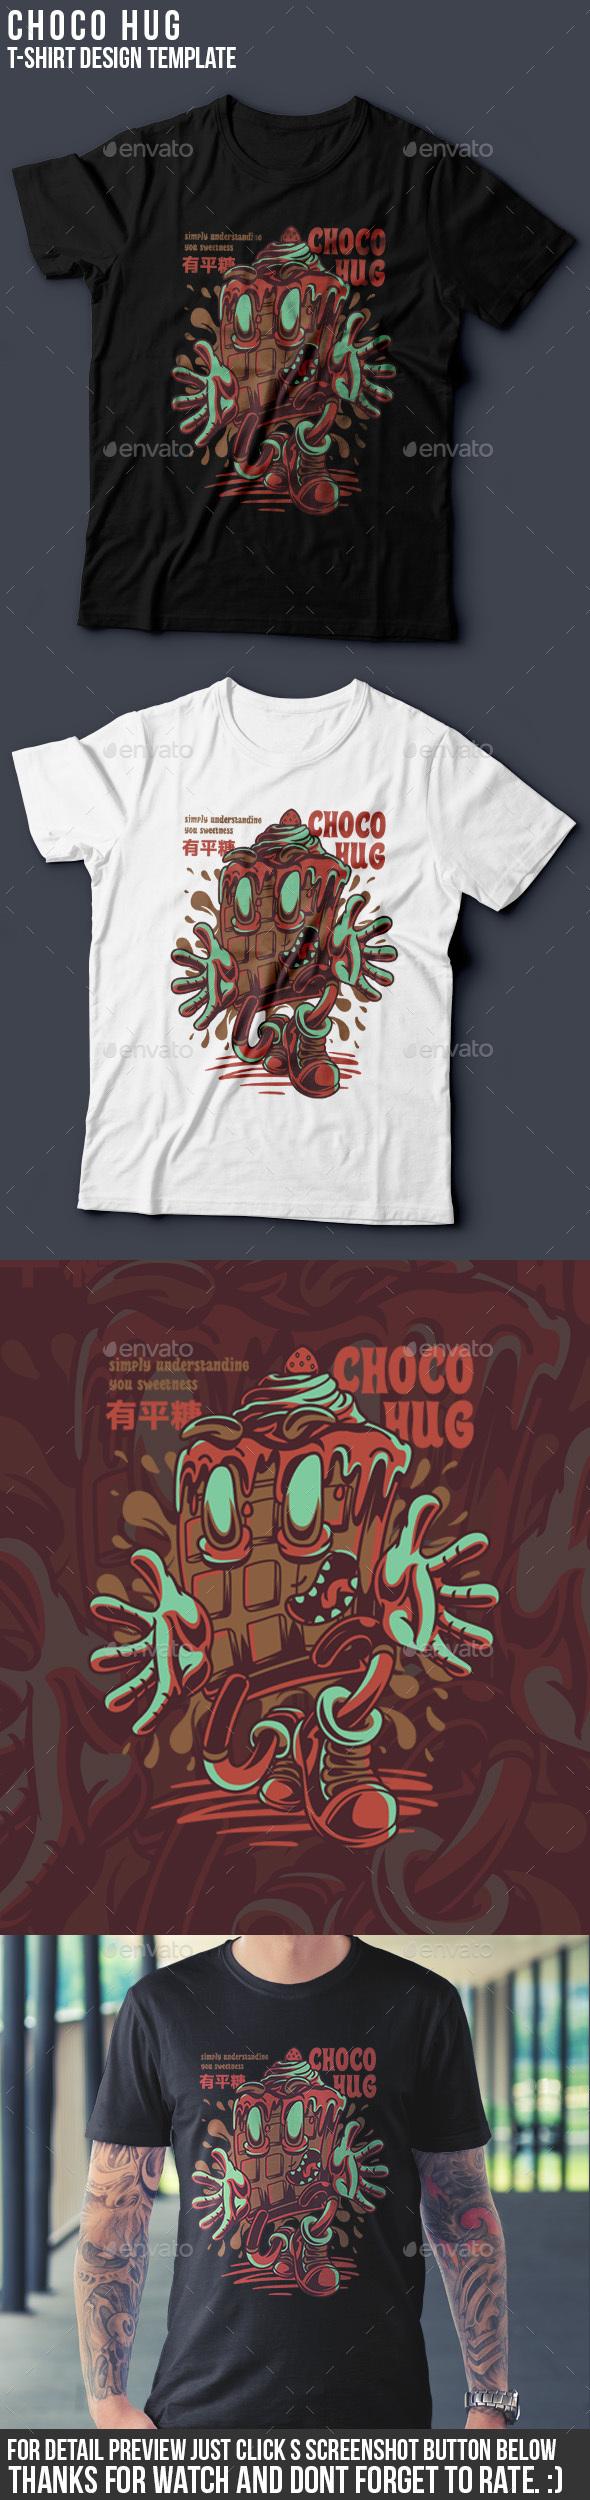 Choco Hug T-Shirt Design - Business T-Shirts